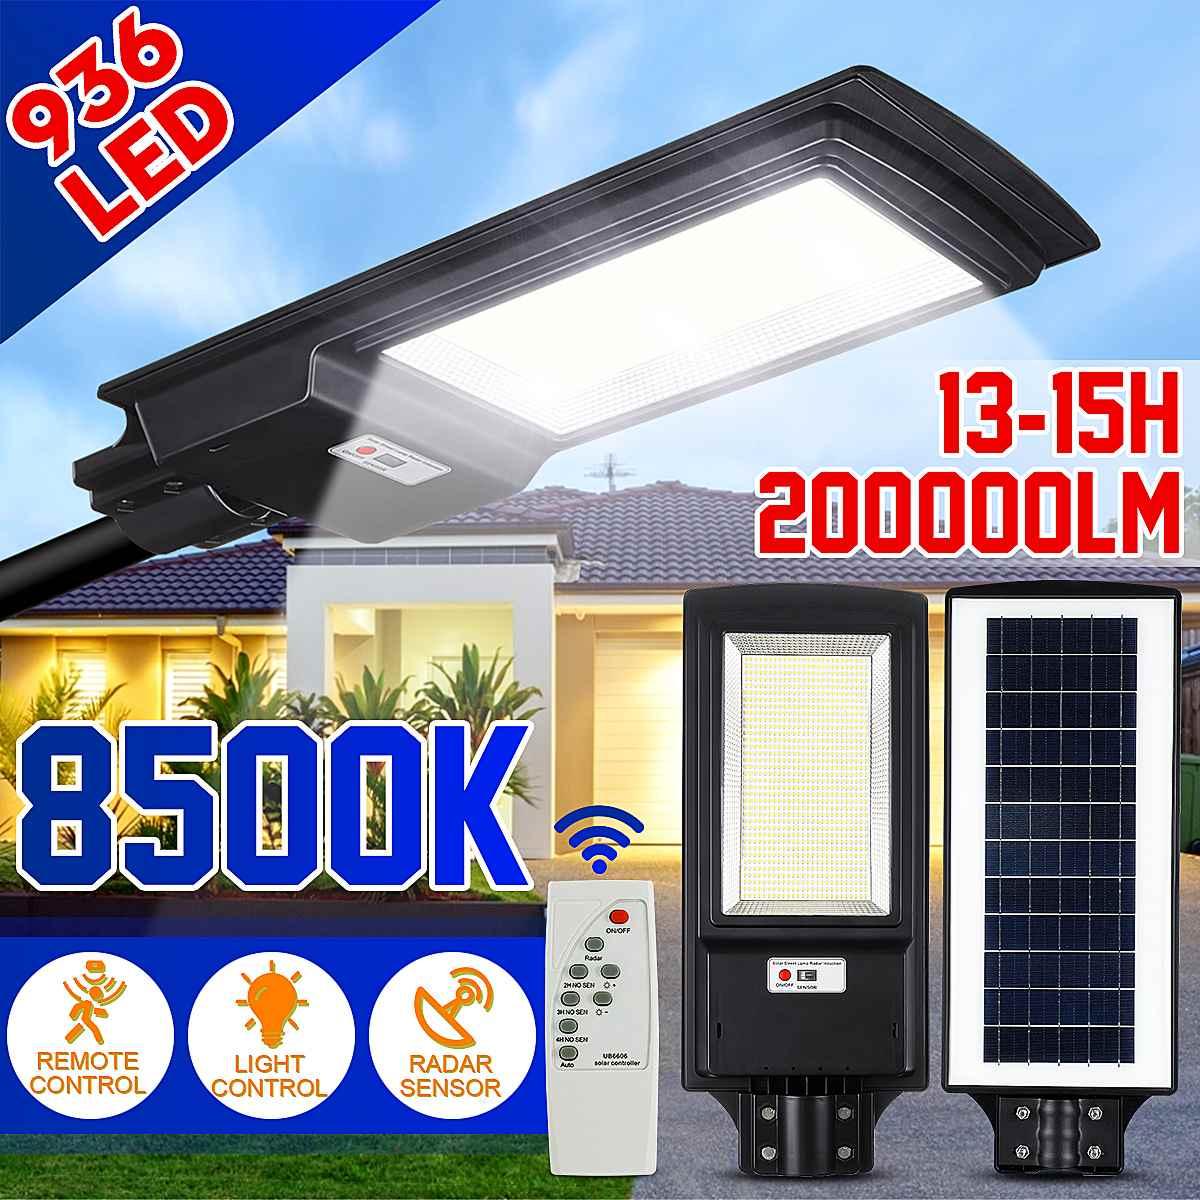 3600W Solar Street Road Light Motion Sensor+RemoteControl Outdoor Yard